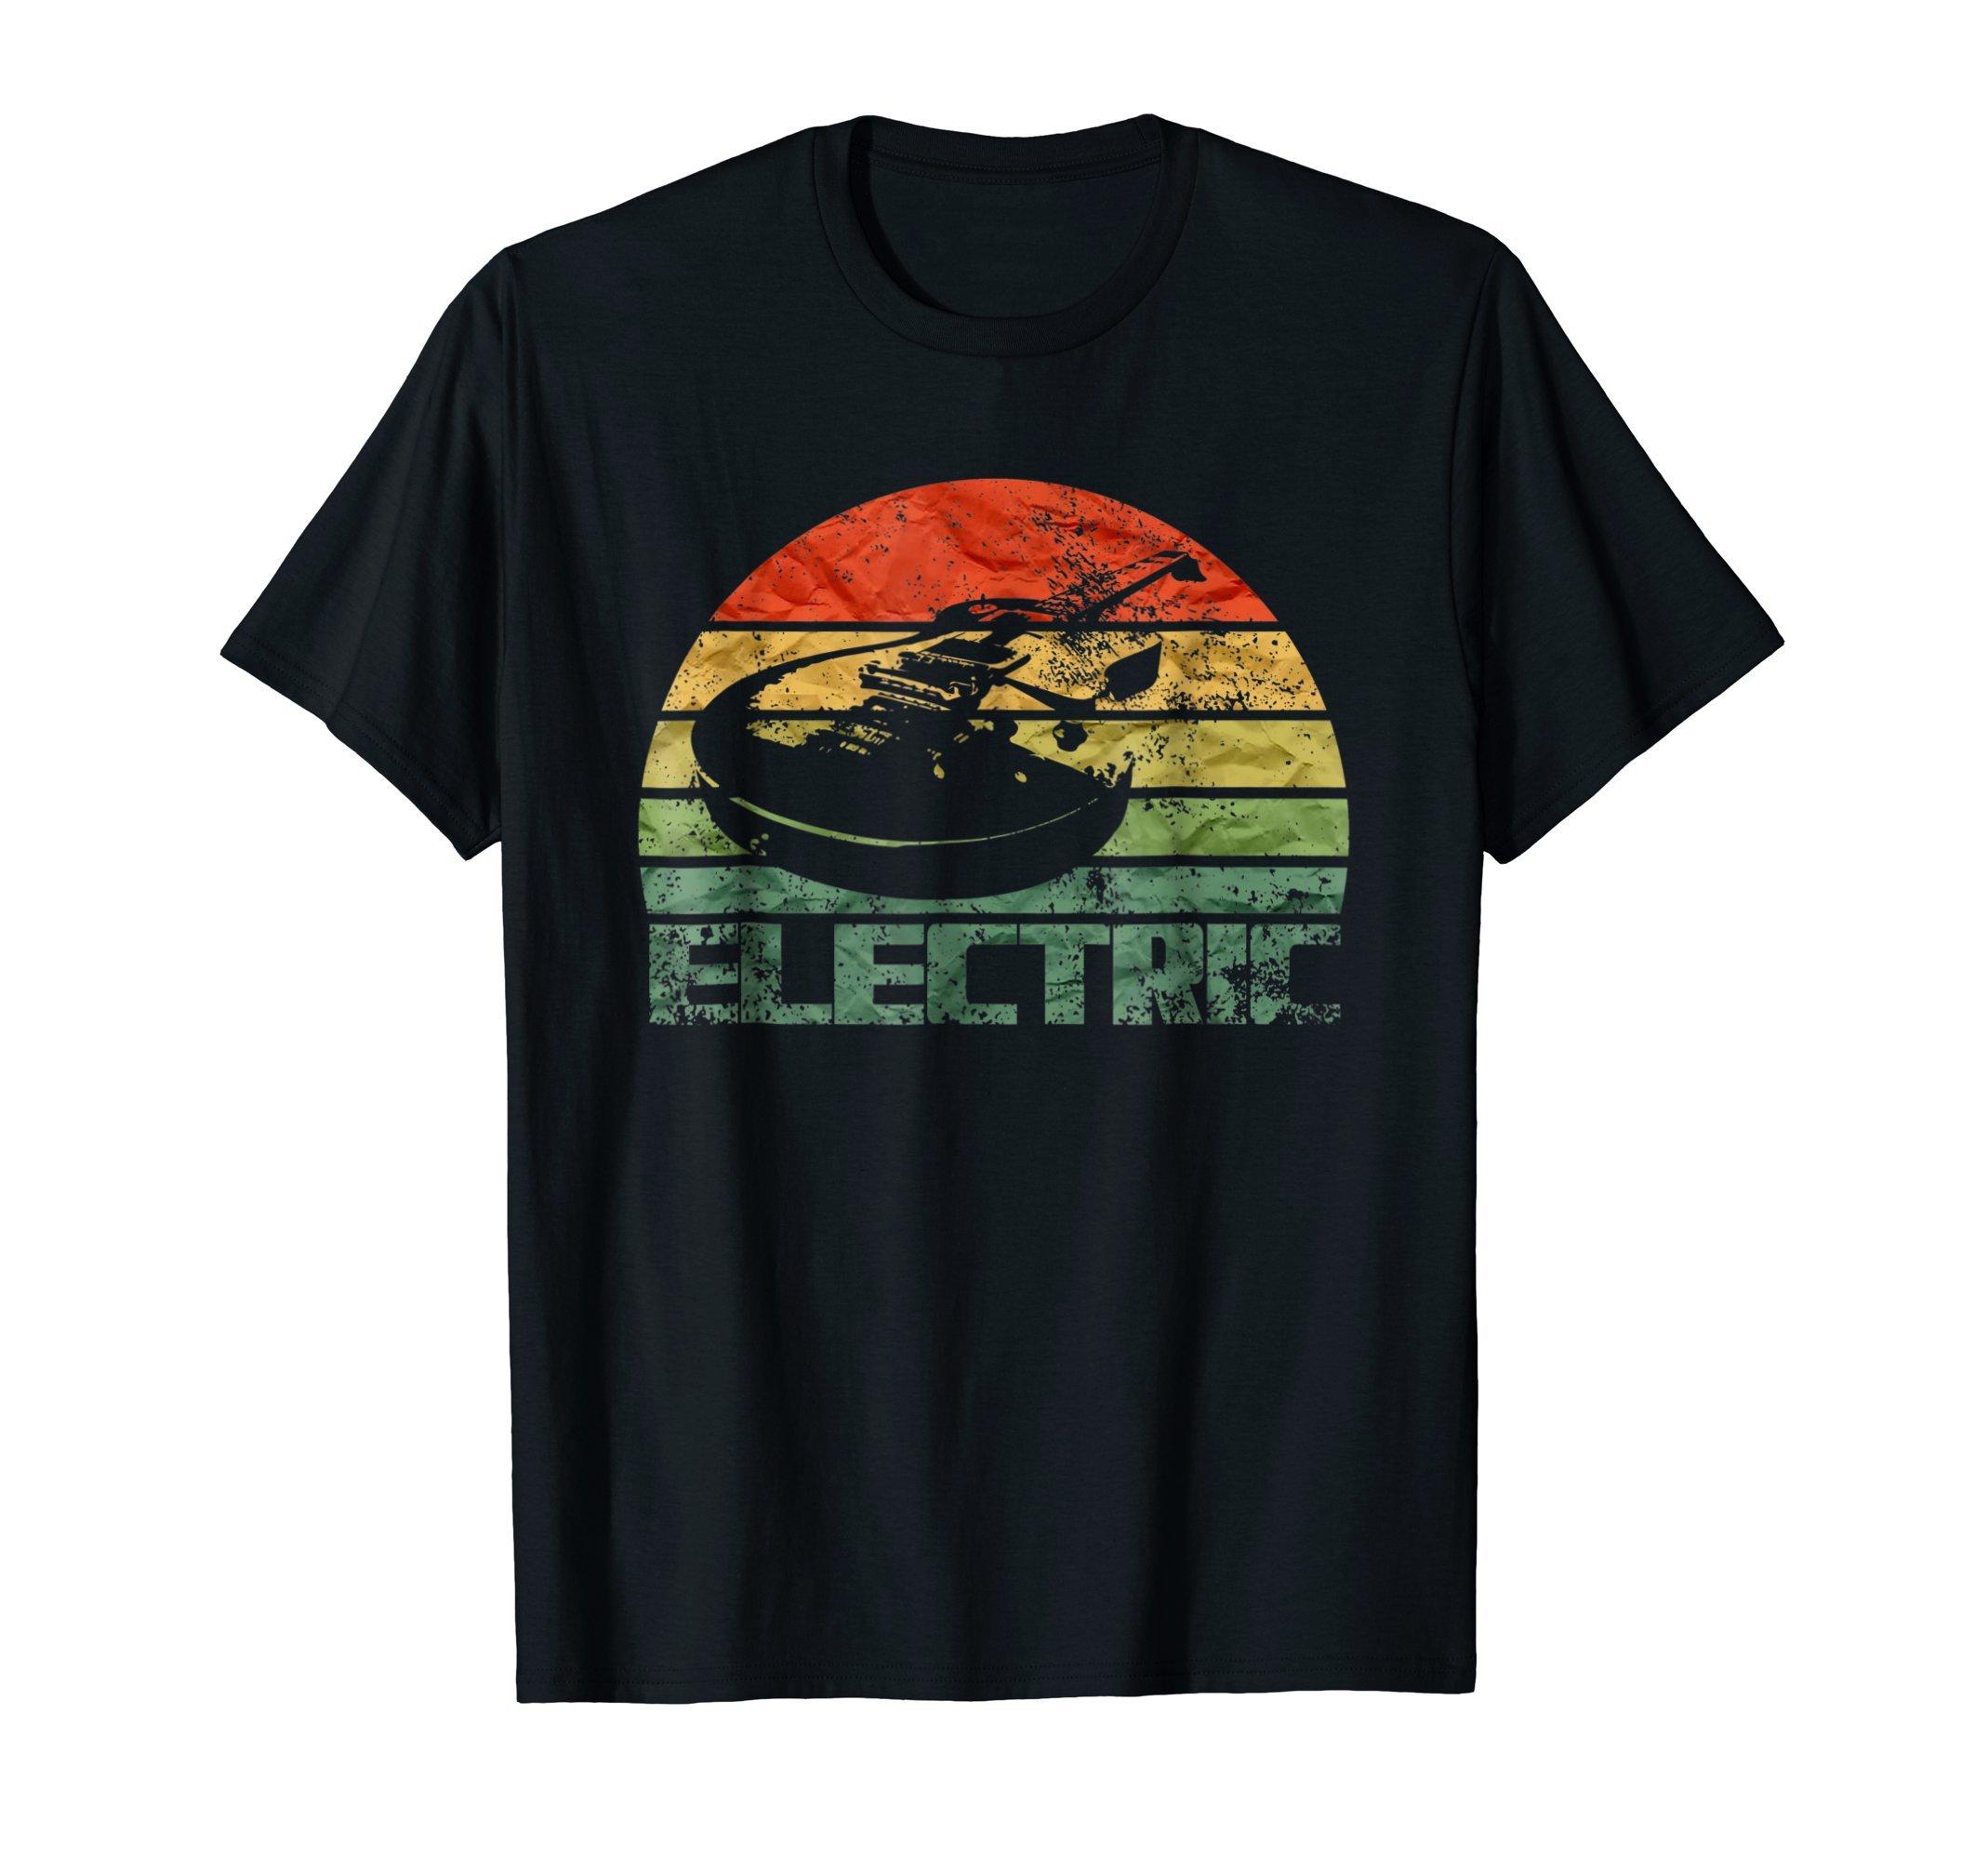 Vintage Electric Guitar T-Shirt Guitar Silhouette Shirt